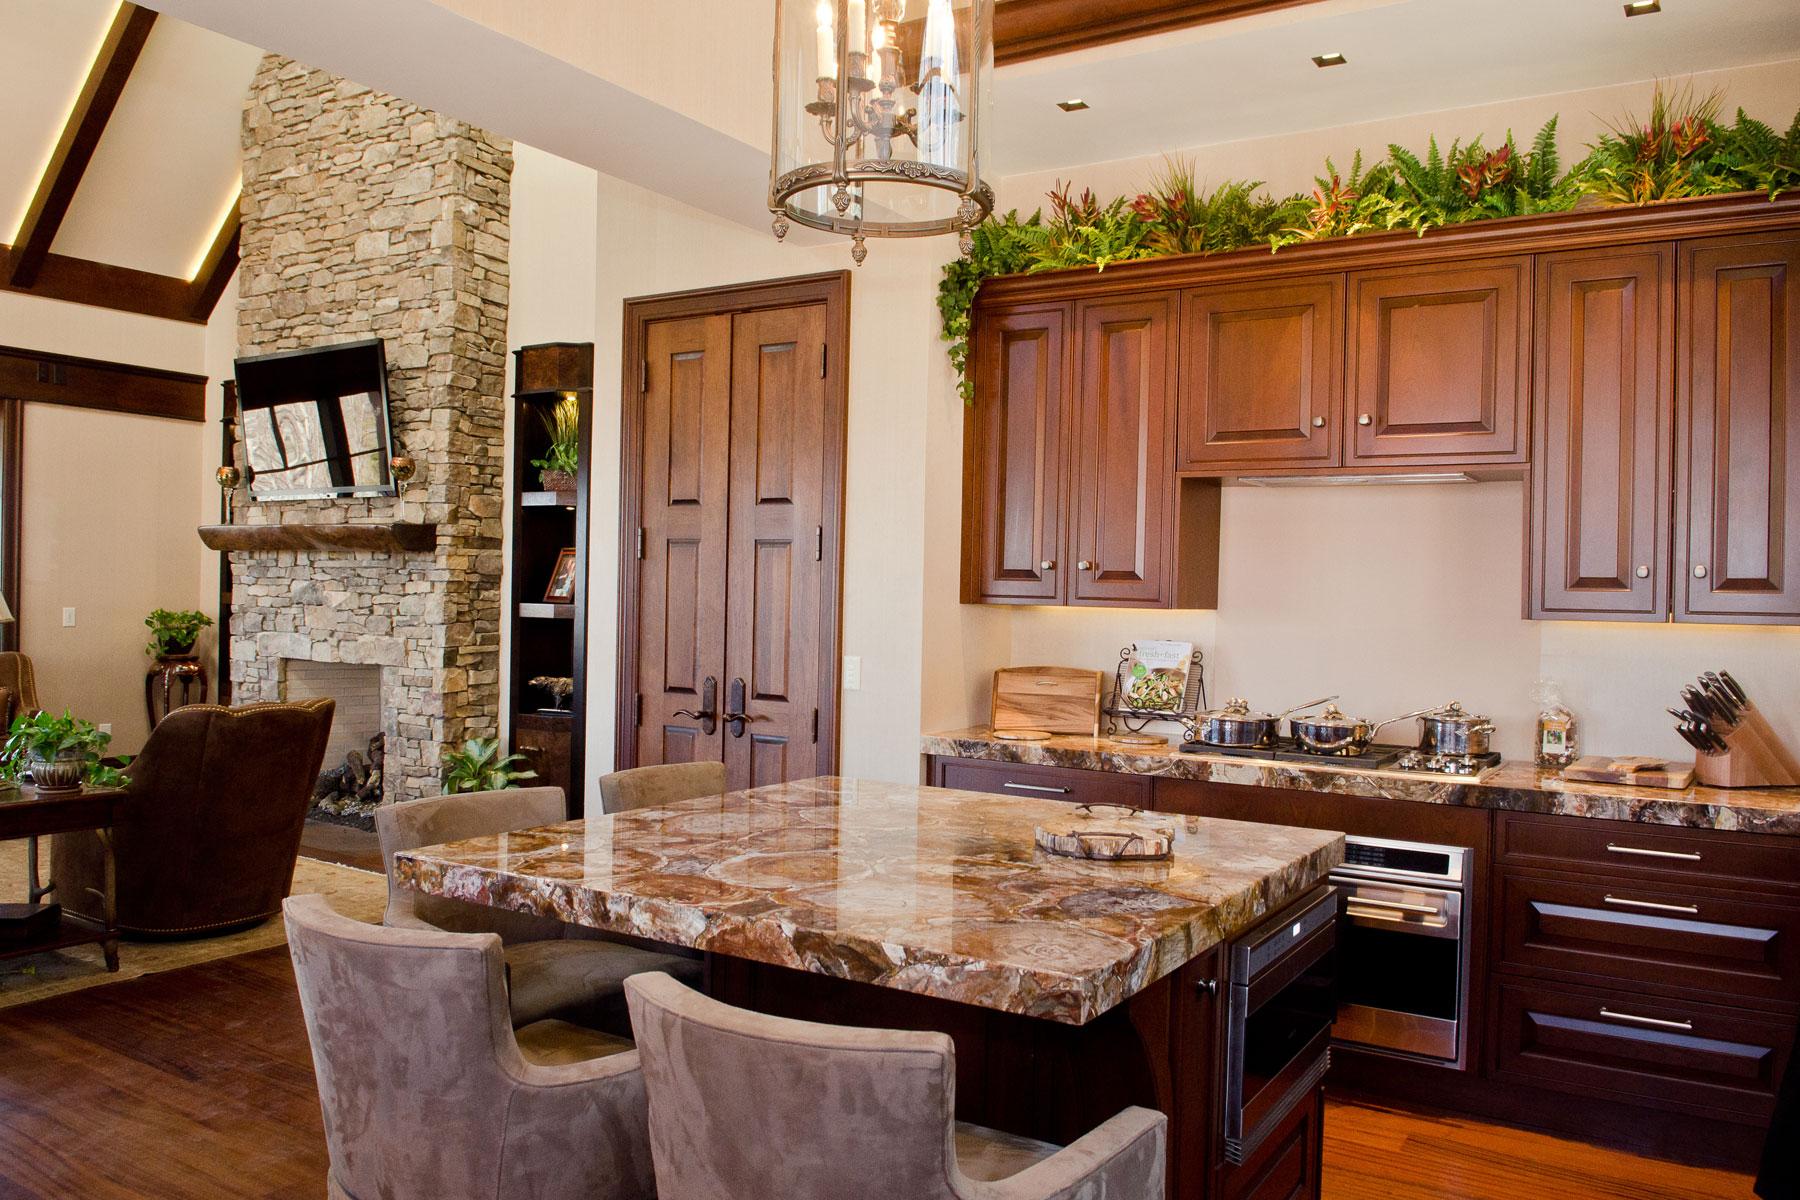 open-kitchen-to-entertaining-space